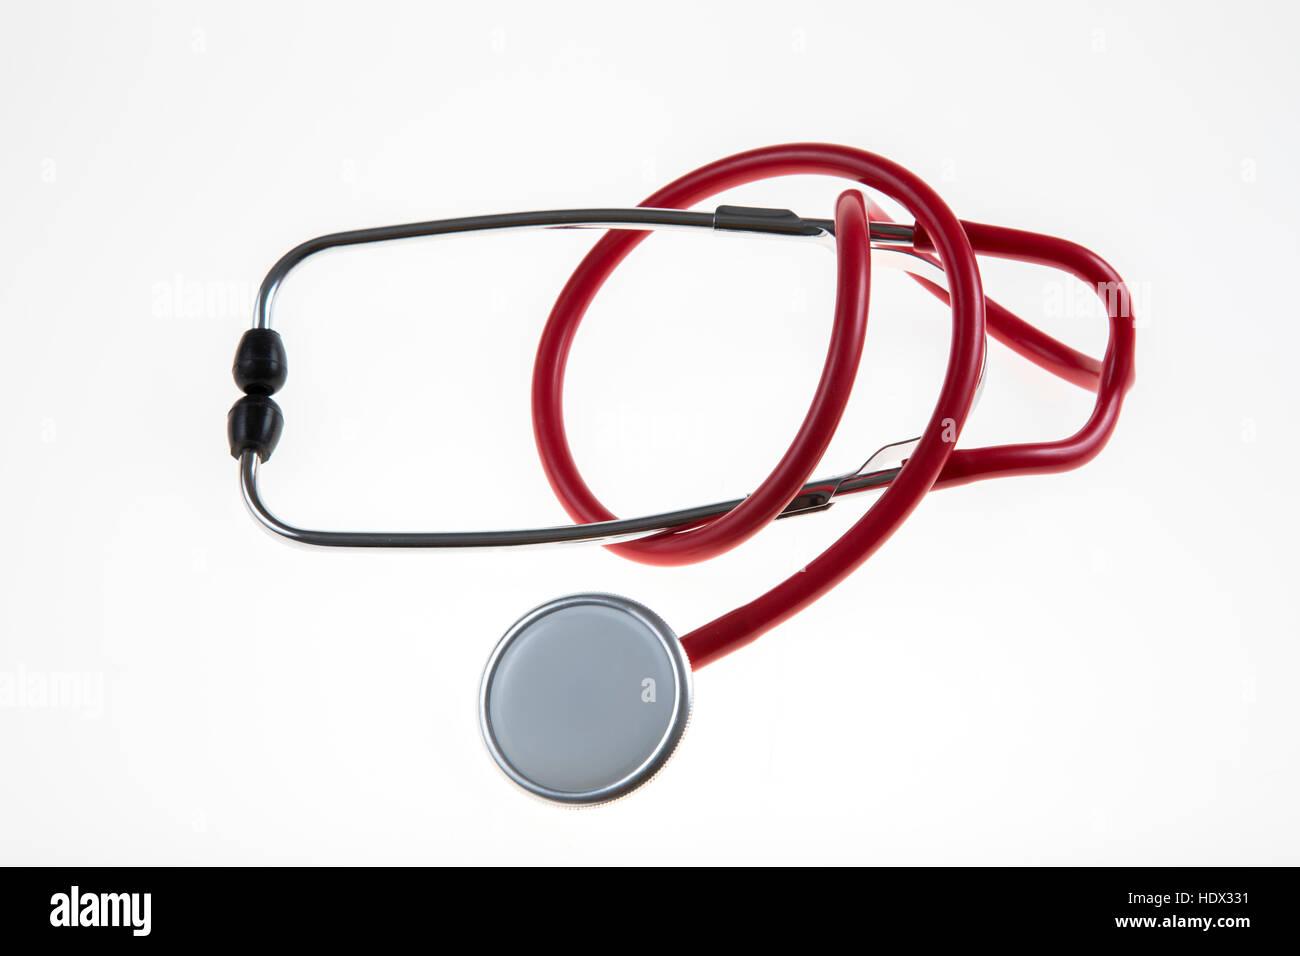 Stetoscope - Stock Image